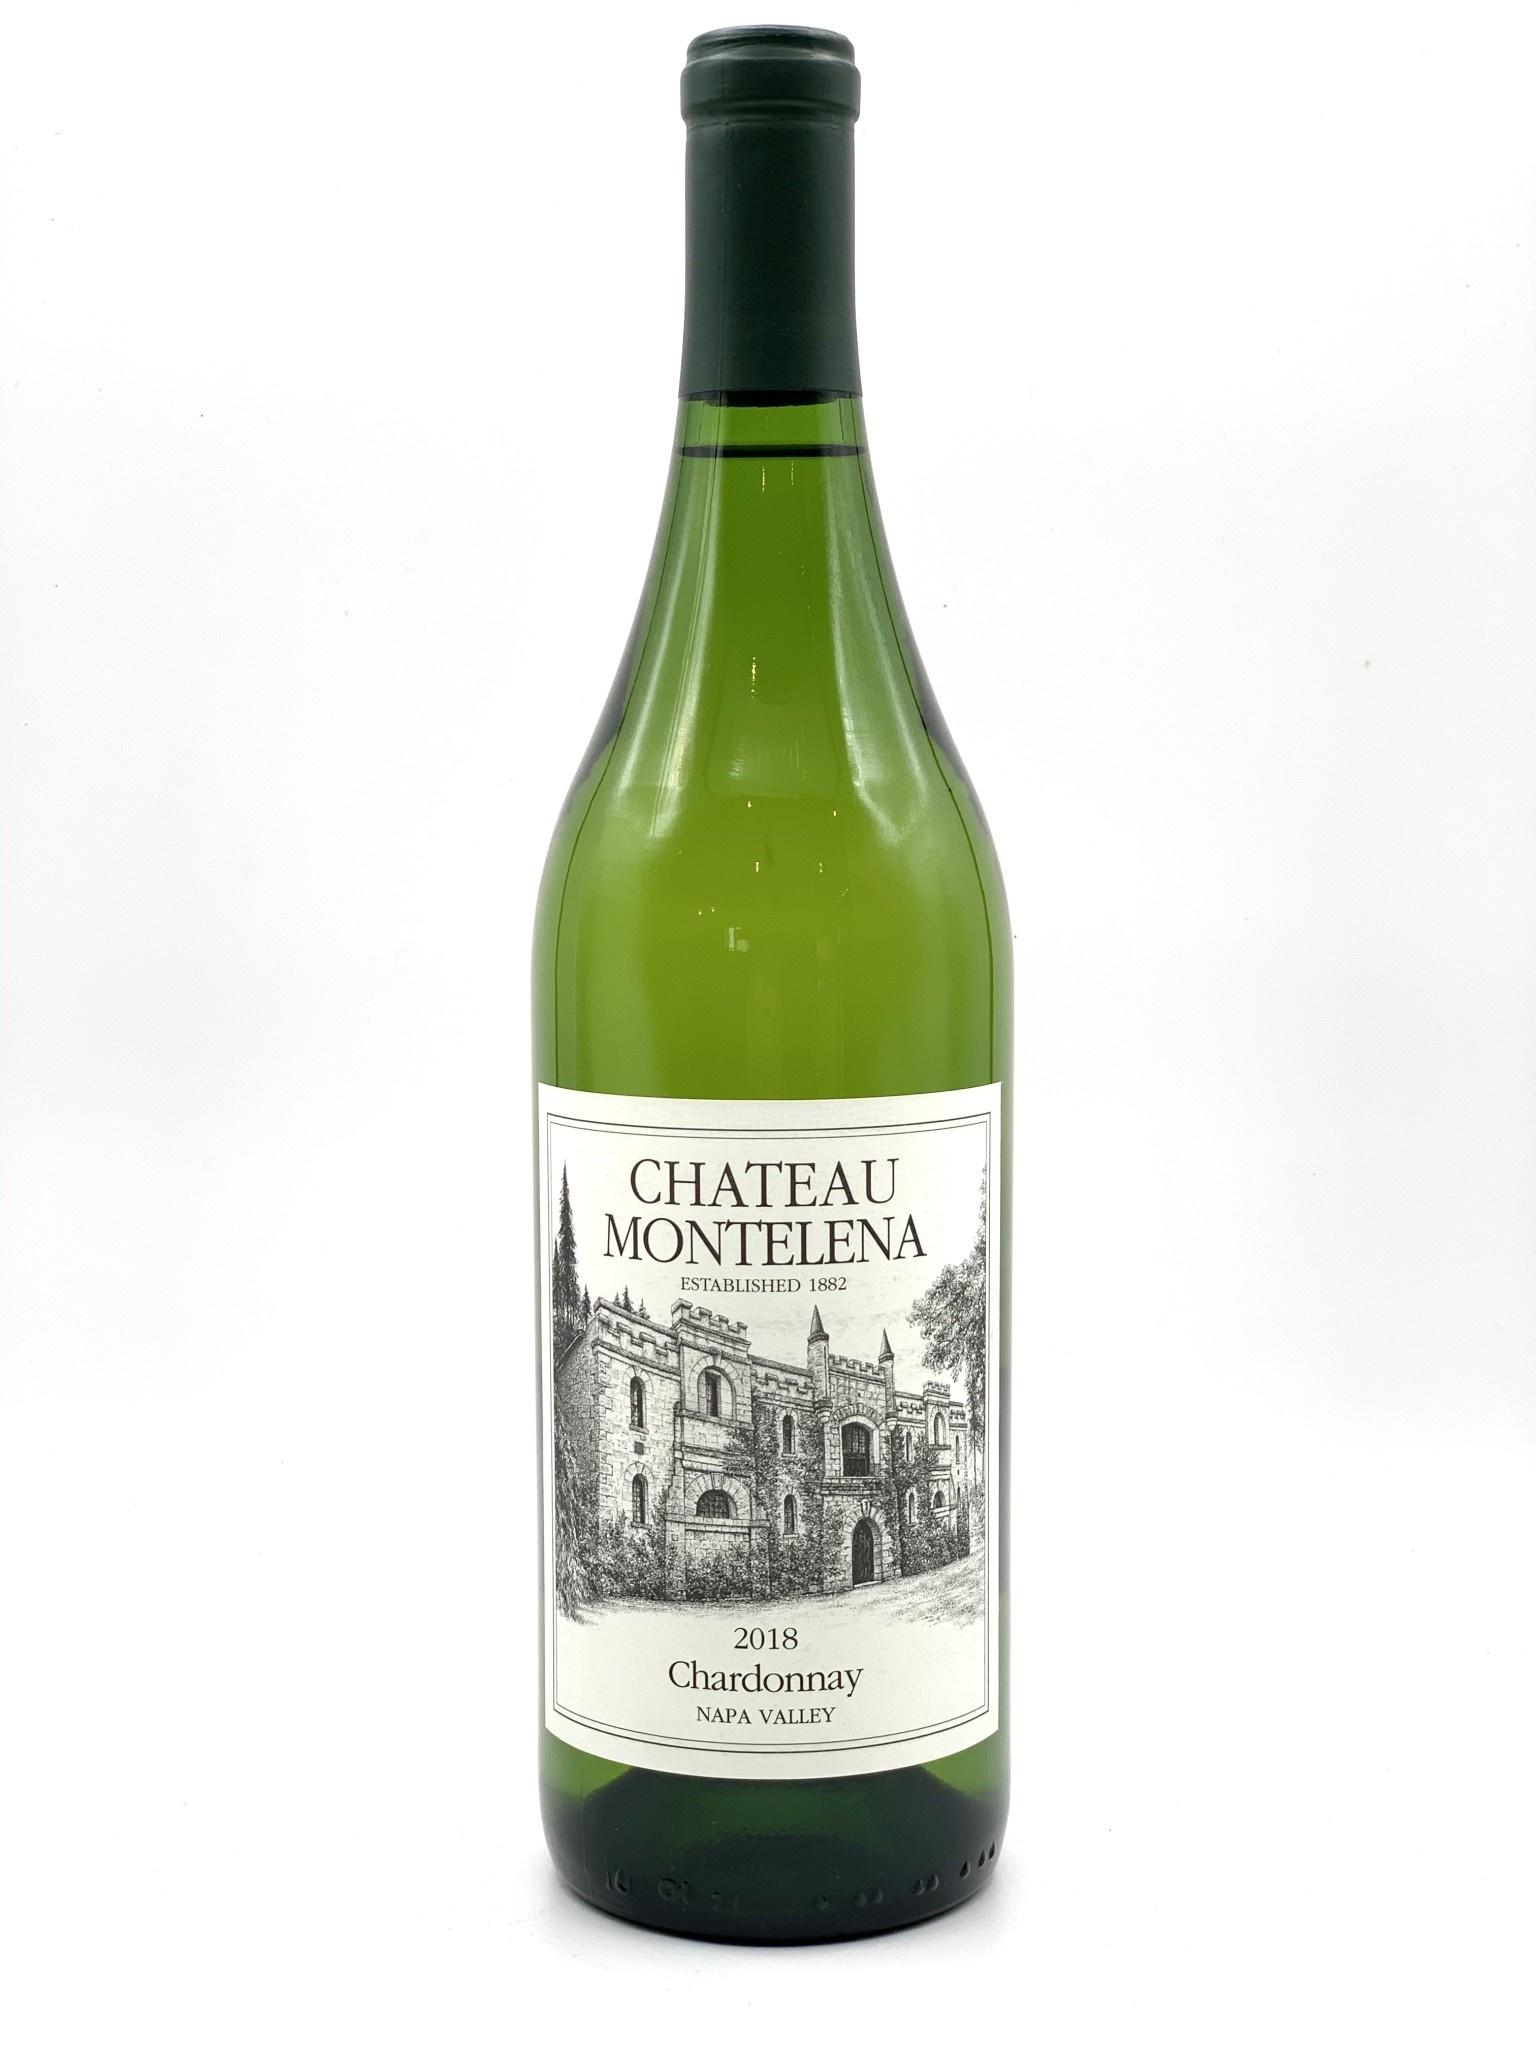 Napa Valley Chardonnay 2018 Chateau Montelena 750ml